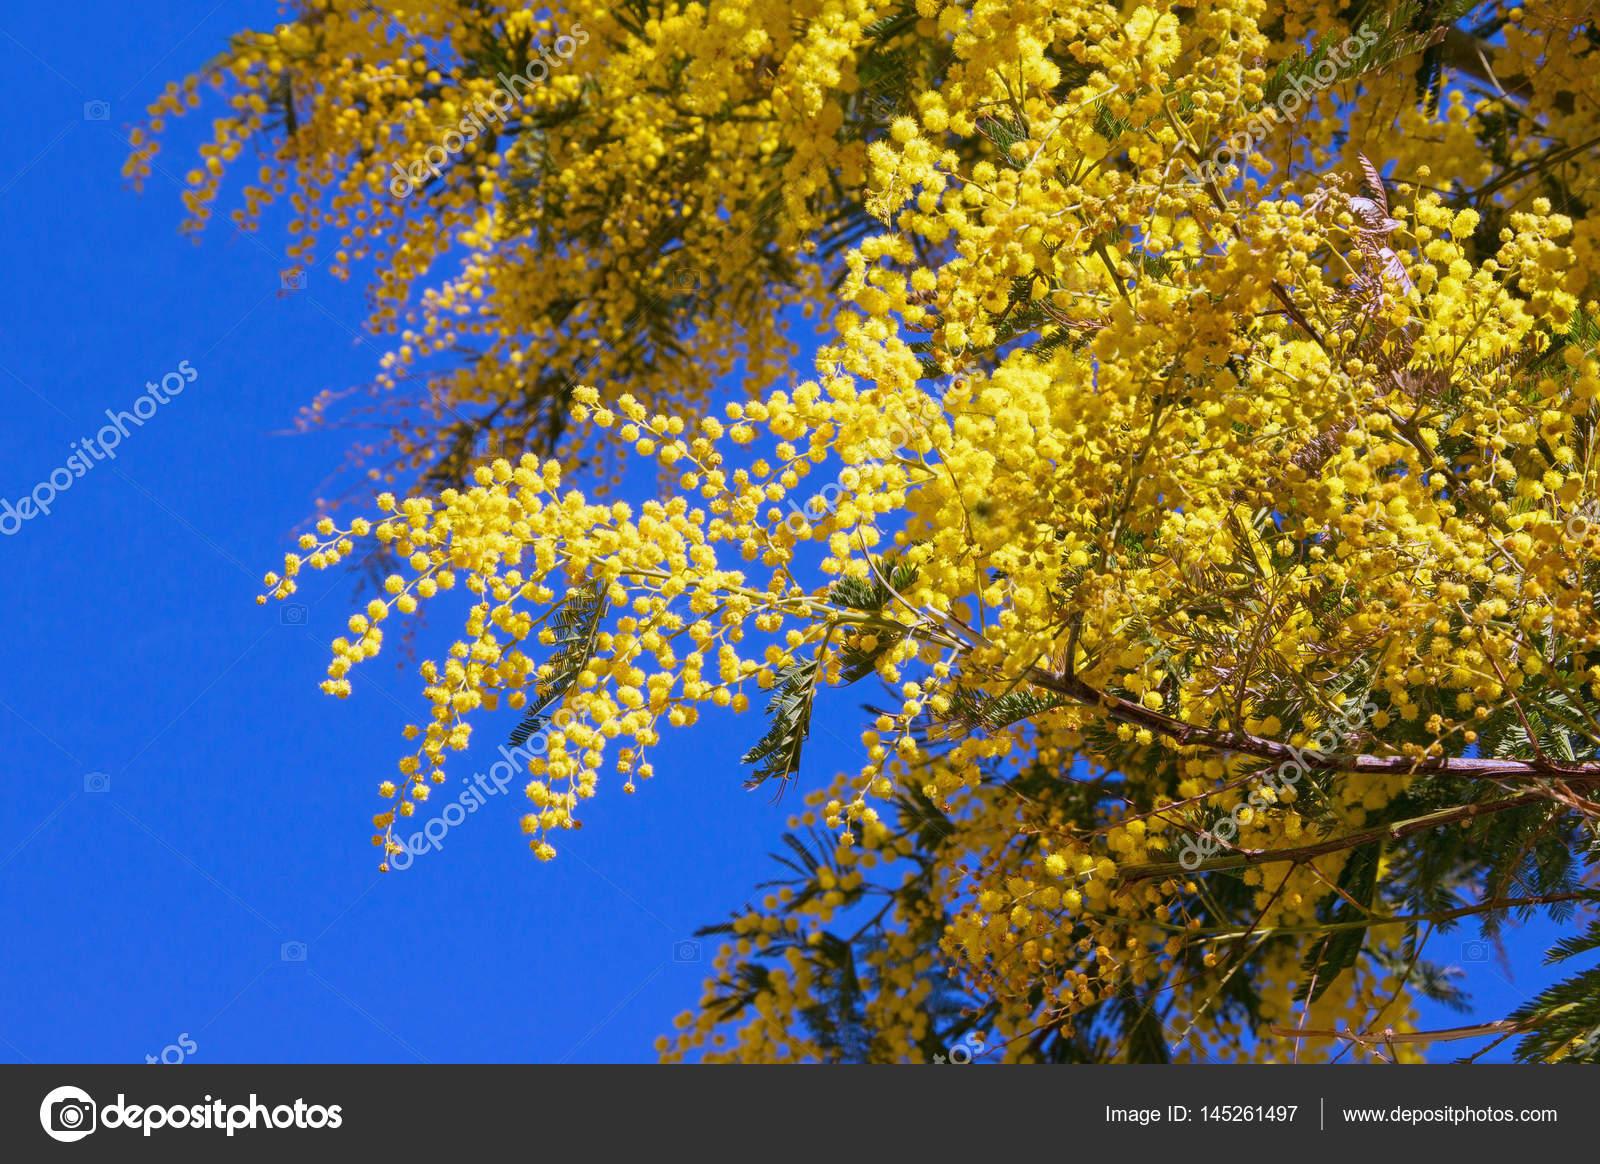 Branches of flowering acacia dealbata mimoza against blue sky branches of flowering acacia dealbata mimoza against blue sky on a sunny spring day photo by olgailinich mightylinksfo